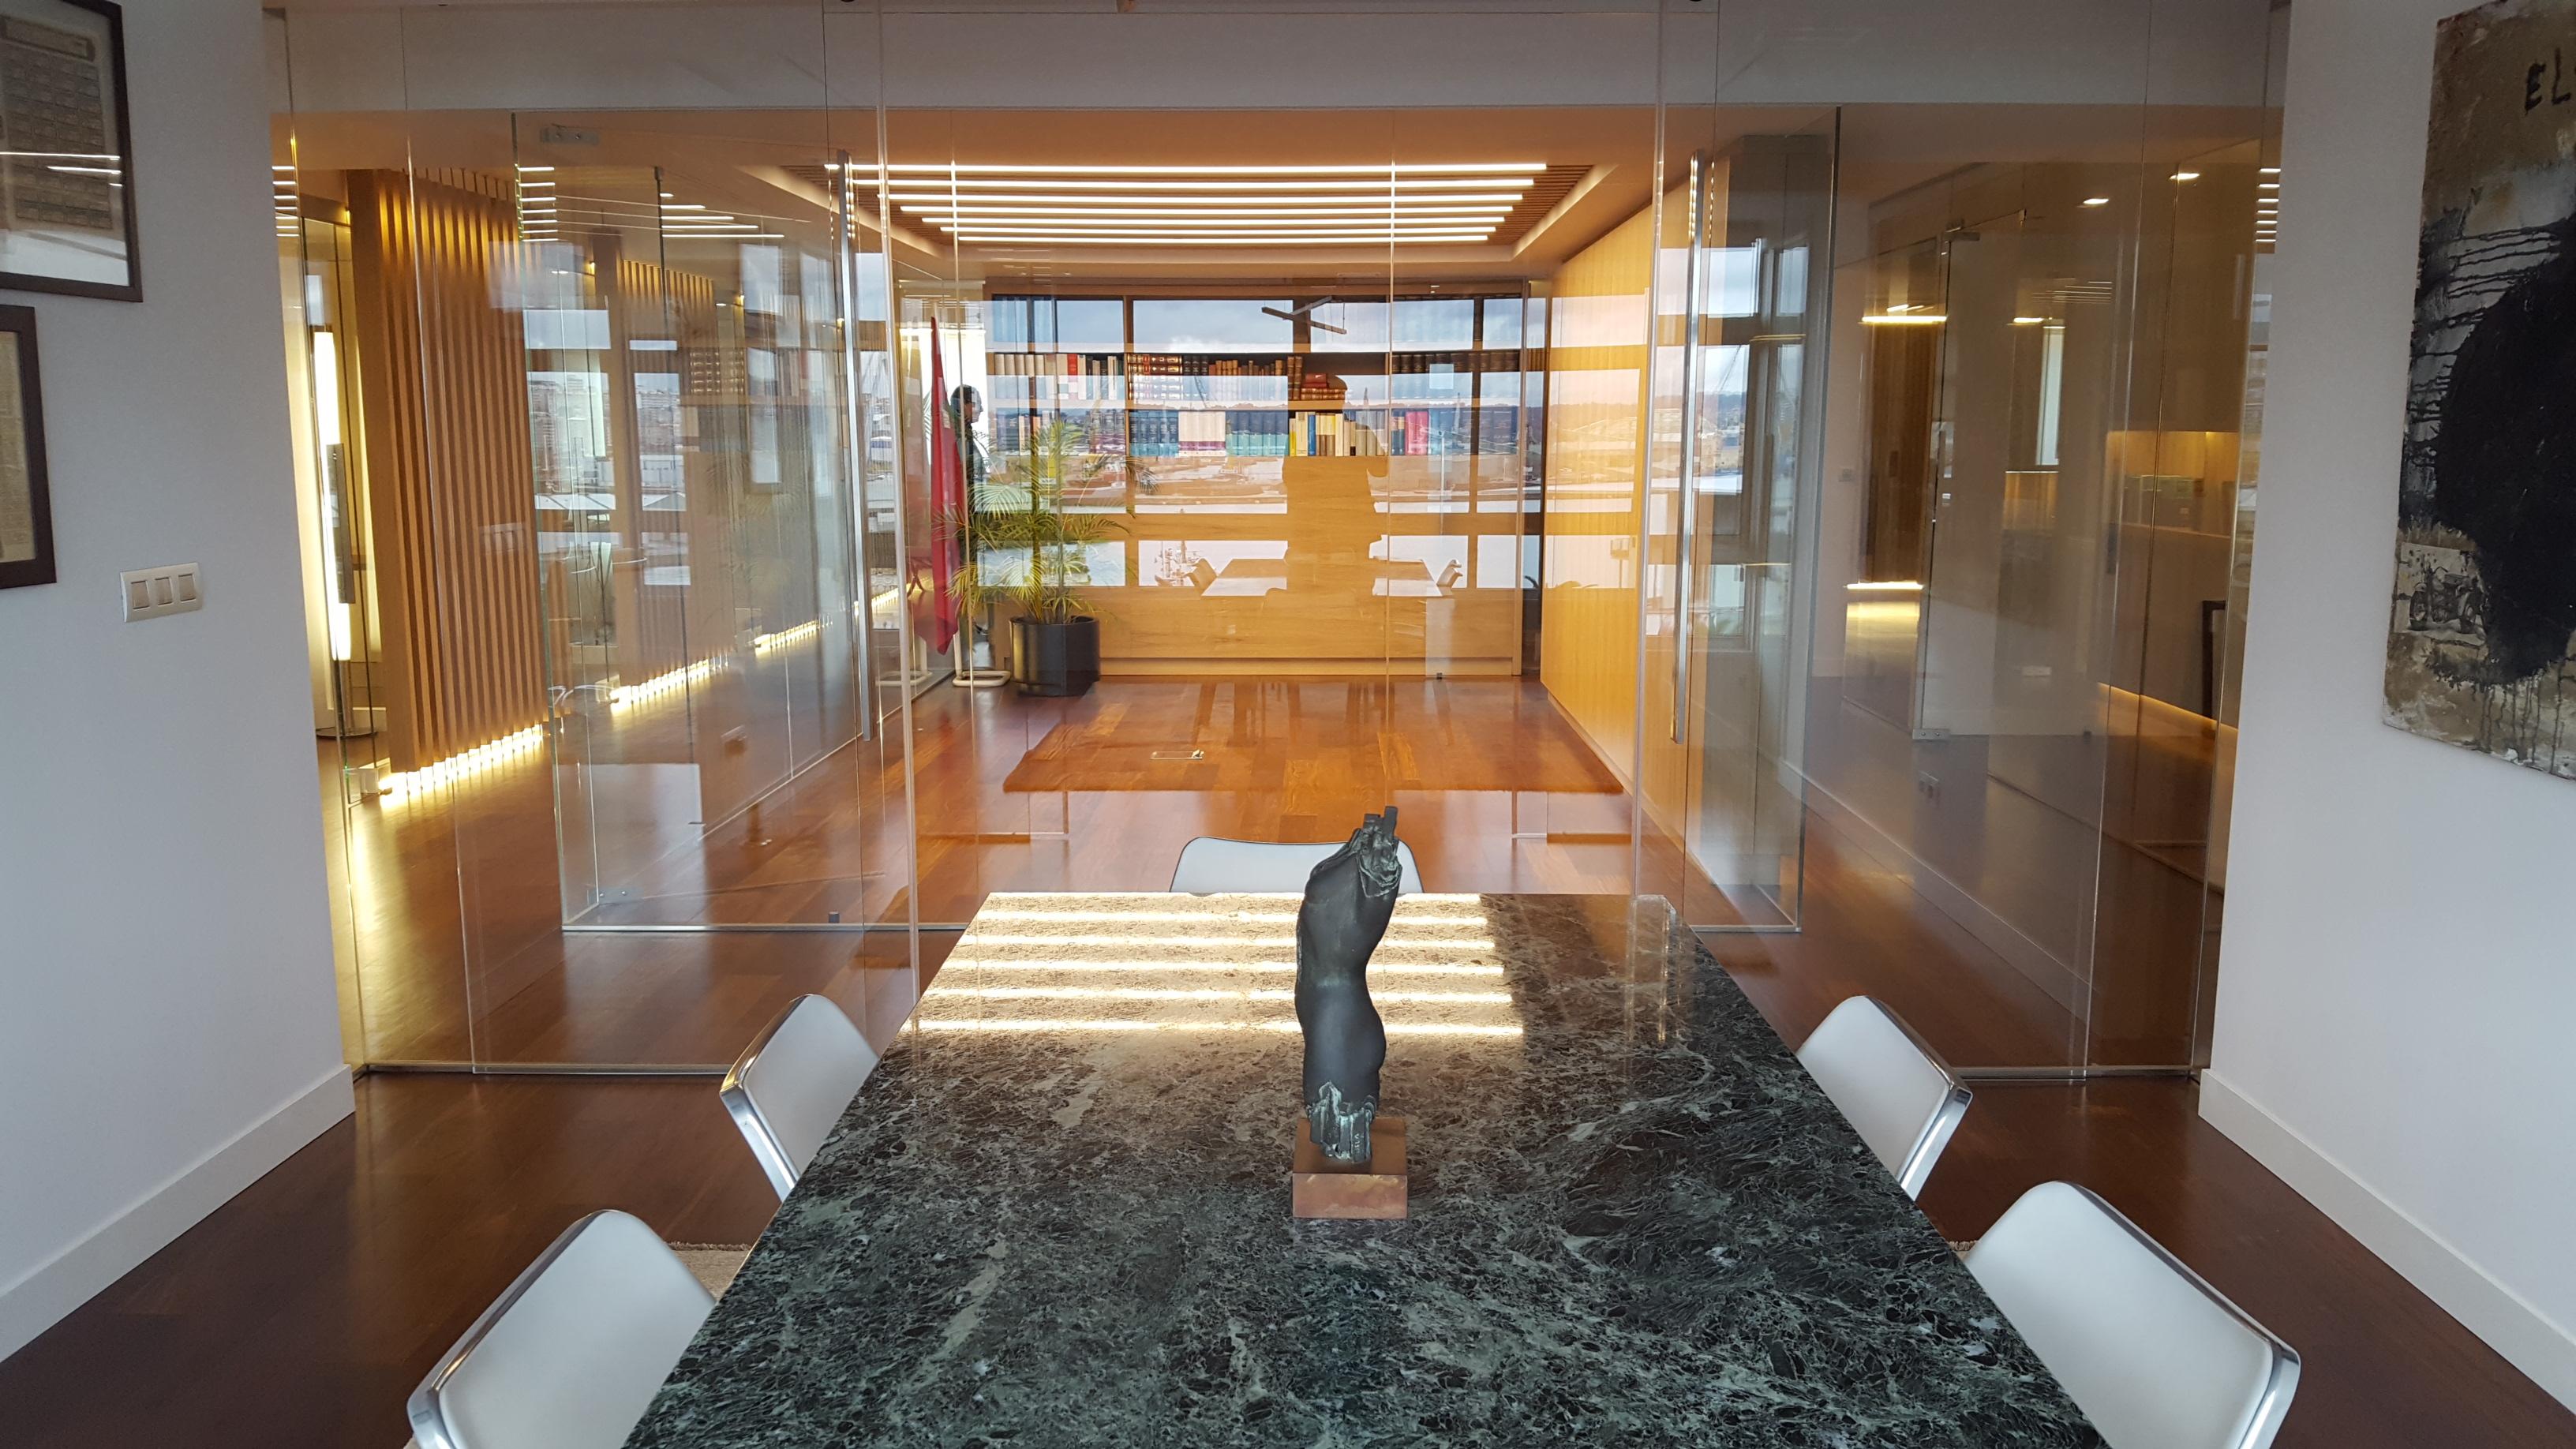 LAWER FIRM INTERIOR DESIGN OFFICE PROJECTPM JUAN BOEDO Archinect